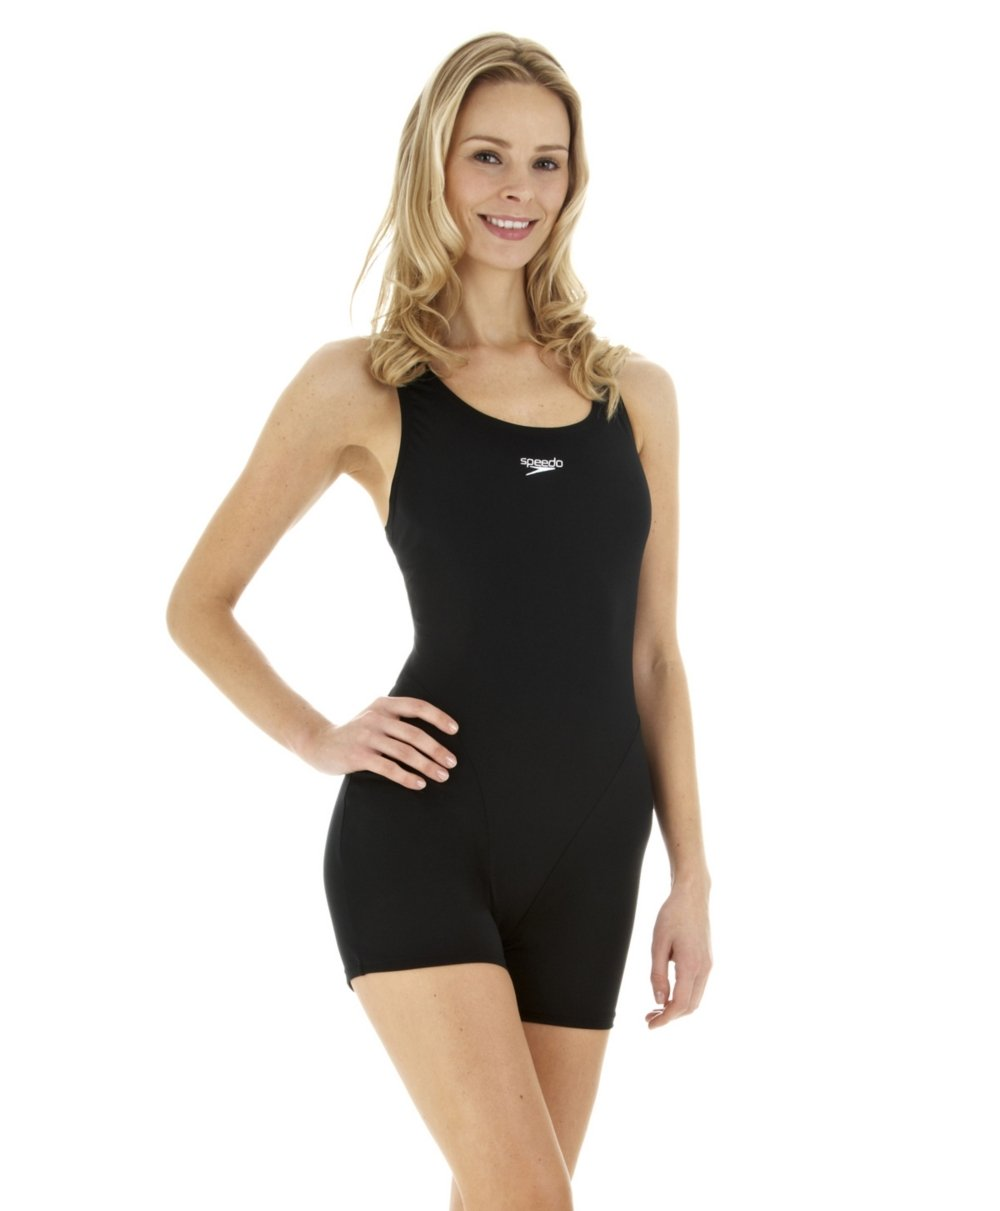 8a5557a5678d Amazon.com   Speedo Myrtle Legsuit Swimsuit - Black   Sports   Outdoors